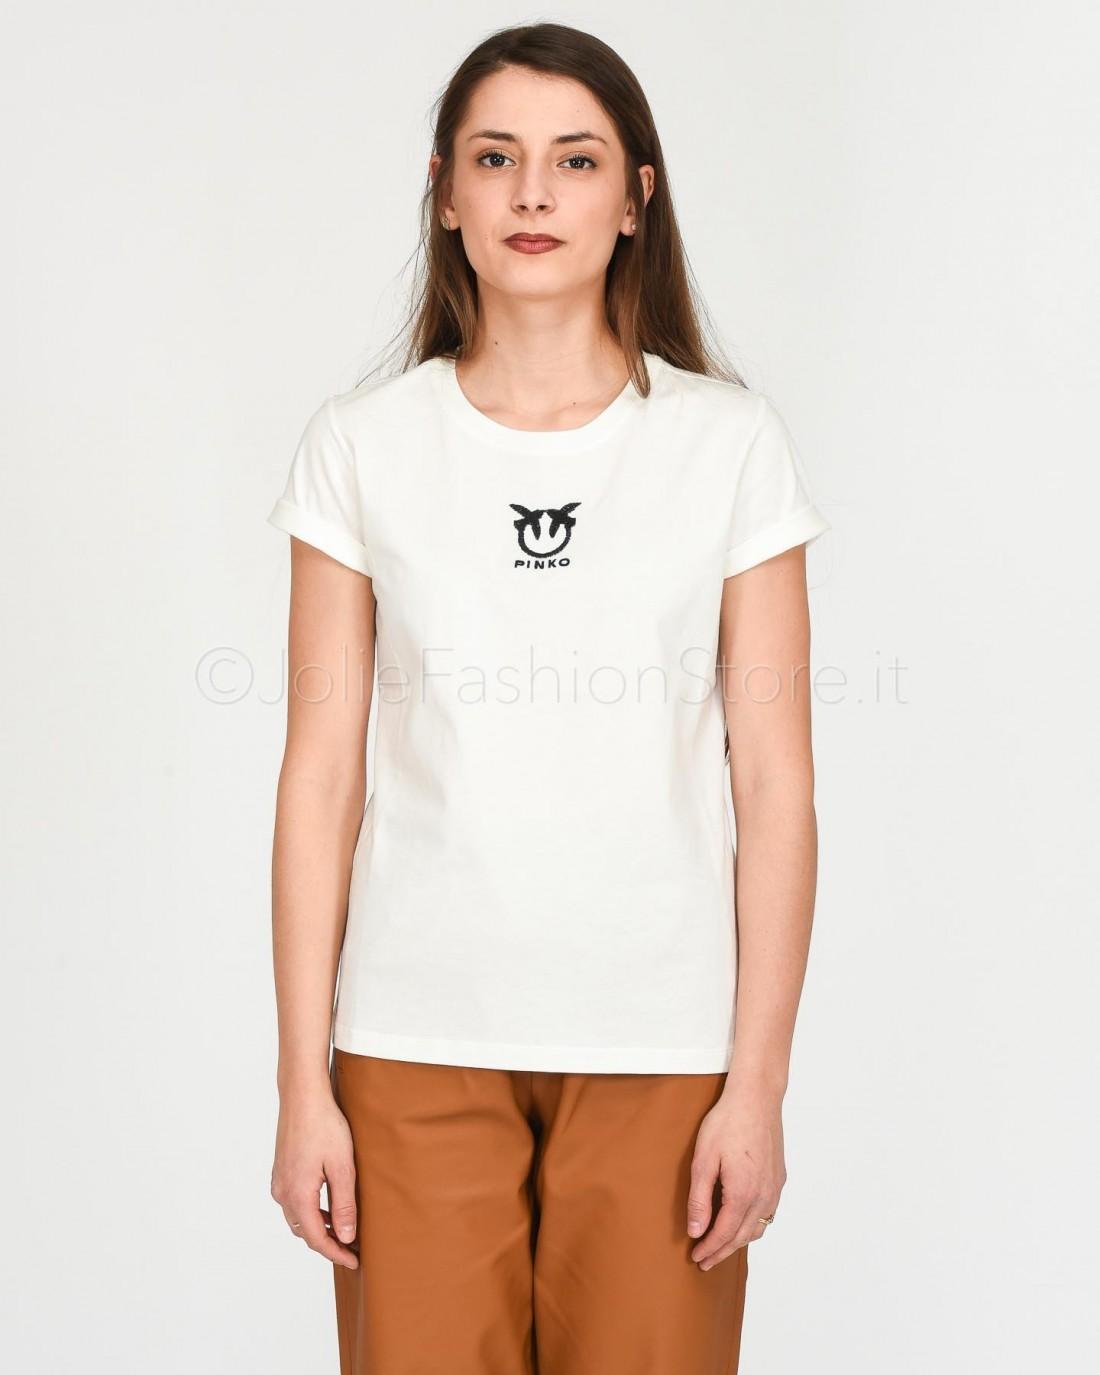 Pinko T-Shirt in Cotone Bianca  1G14YX-Z05